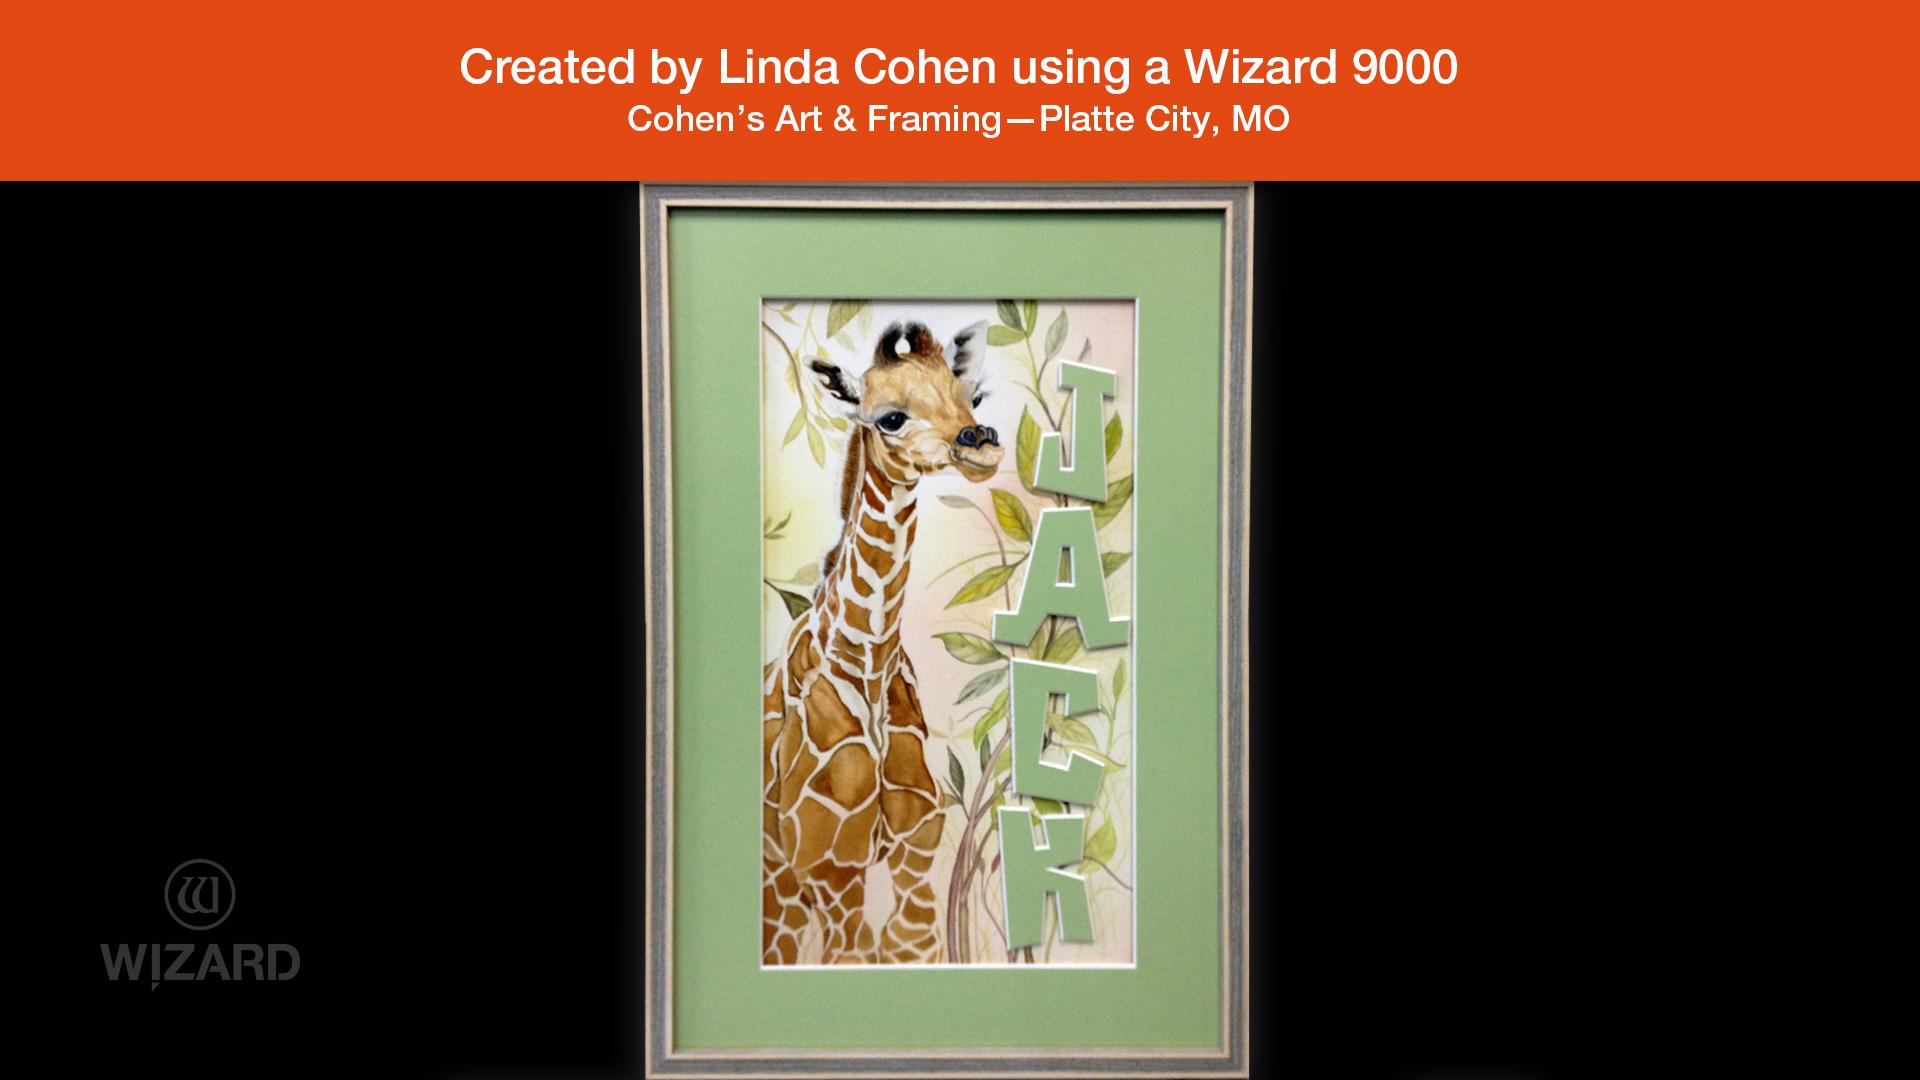 linda-cohen-1.jpg